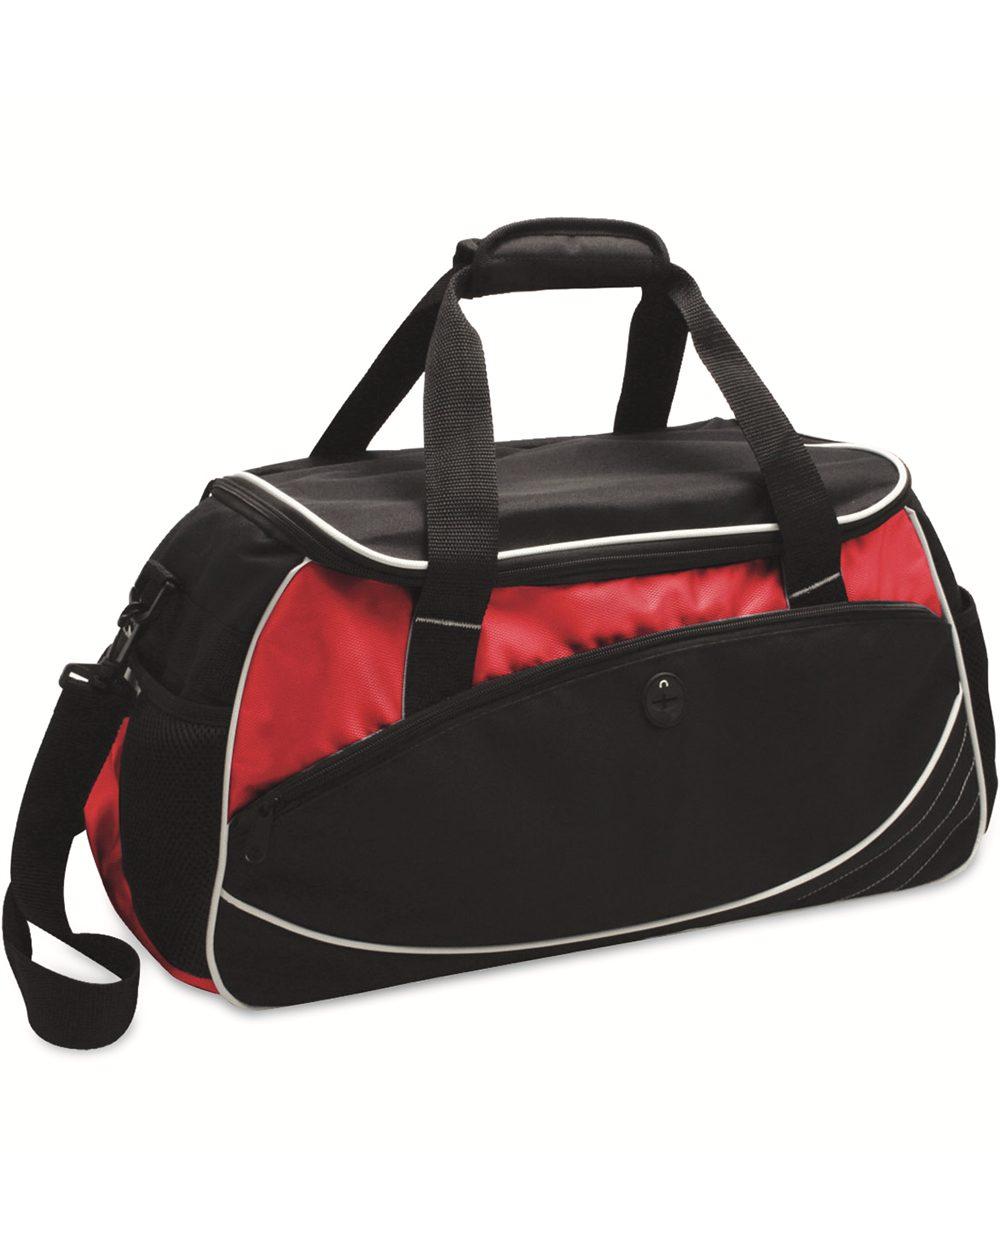 Valubag 20 Inch Sports Duffel Bag - VB0509